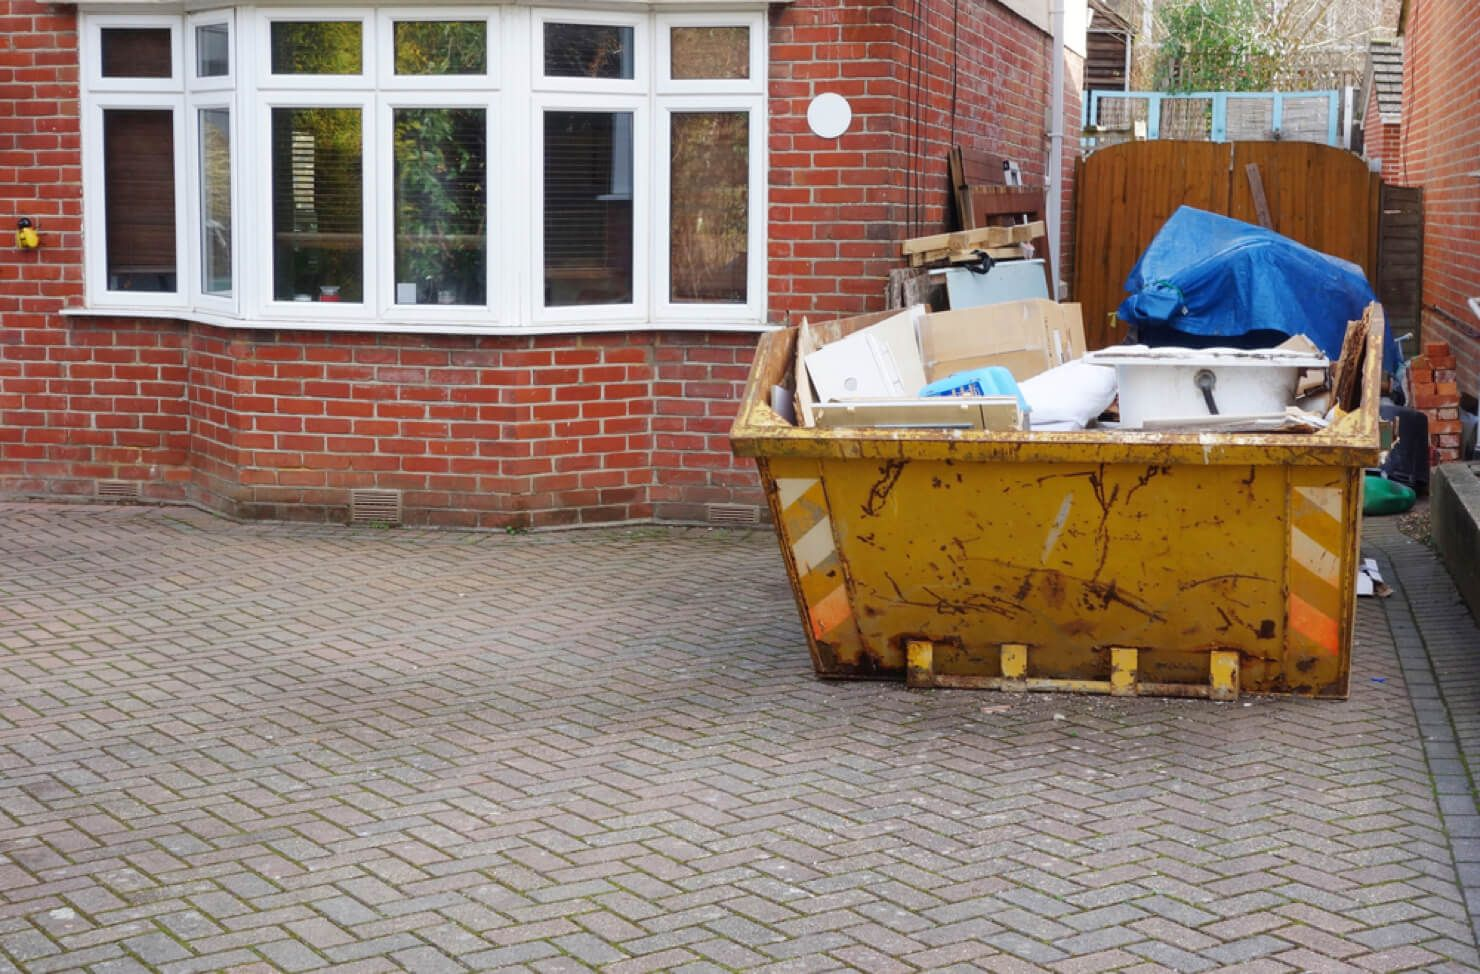 Builder's skip driveway